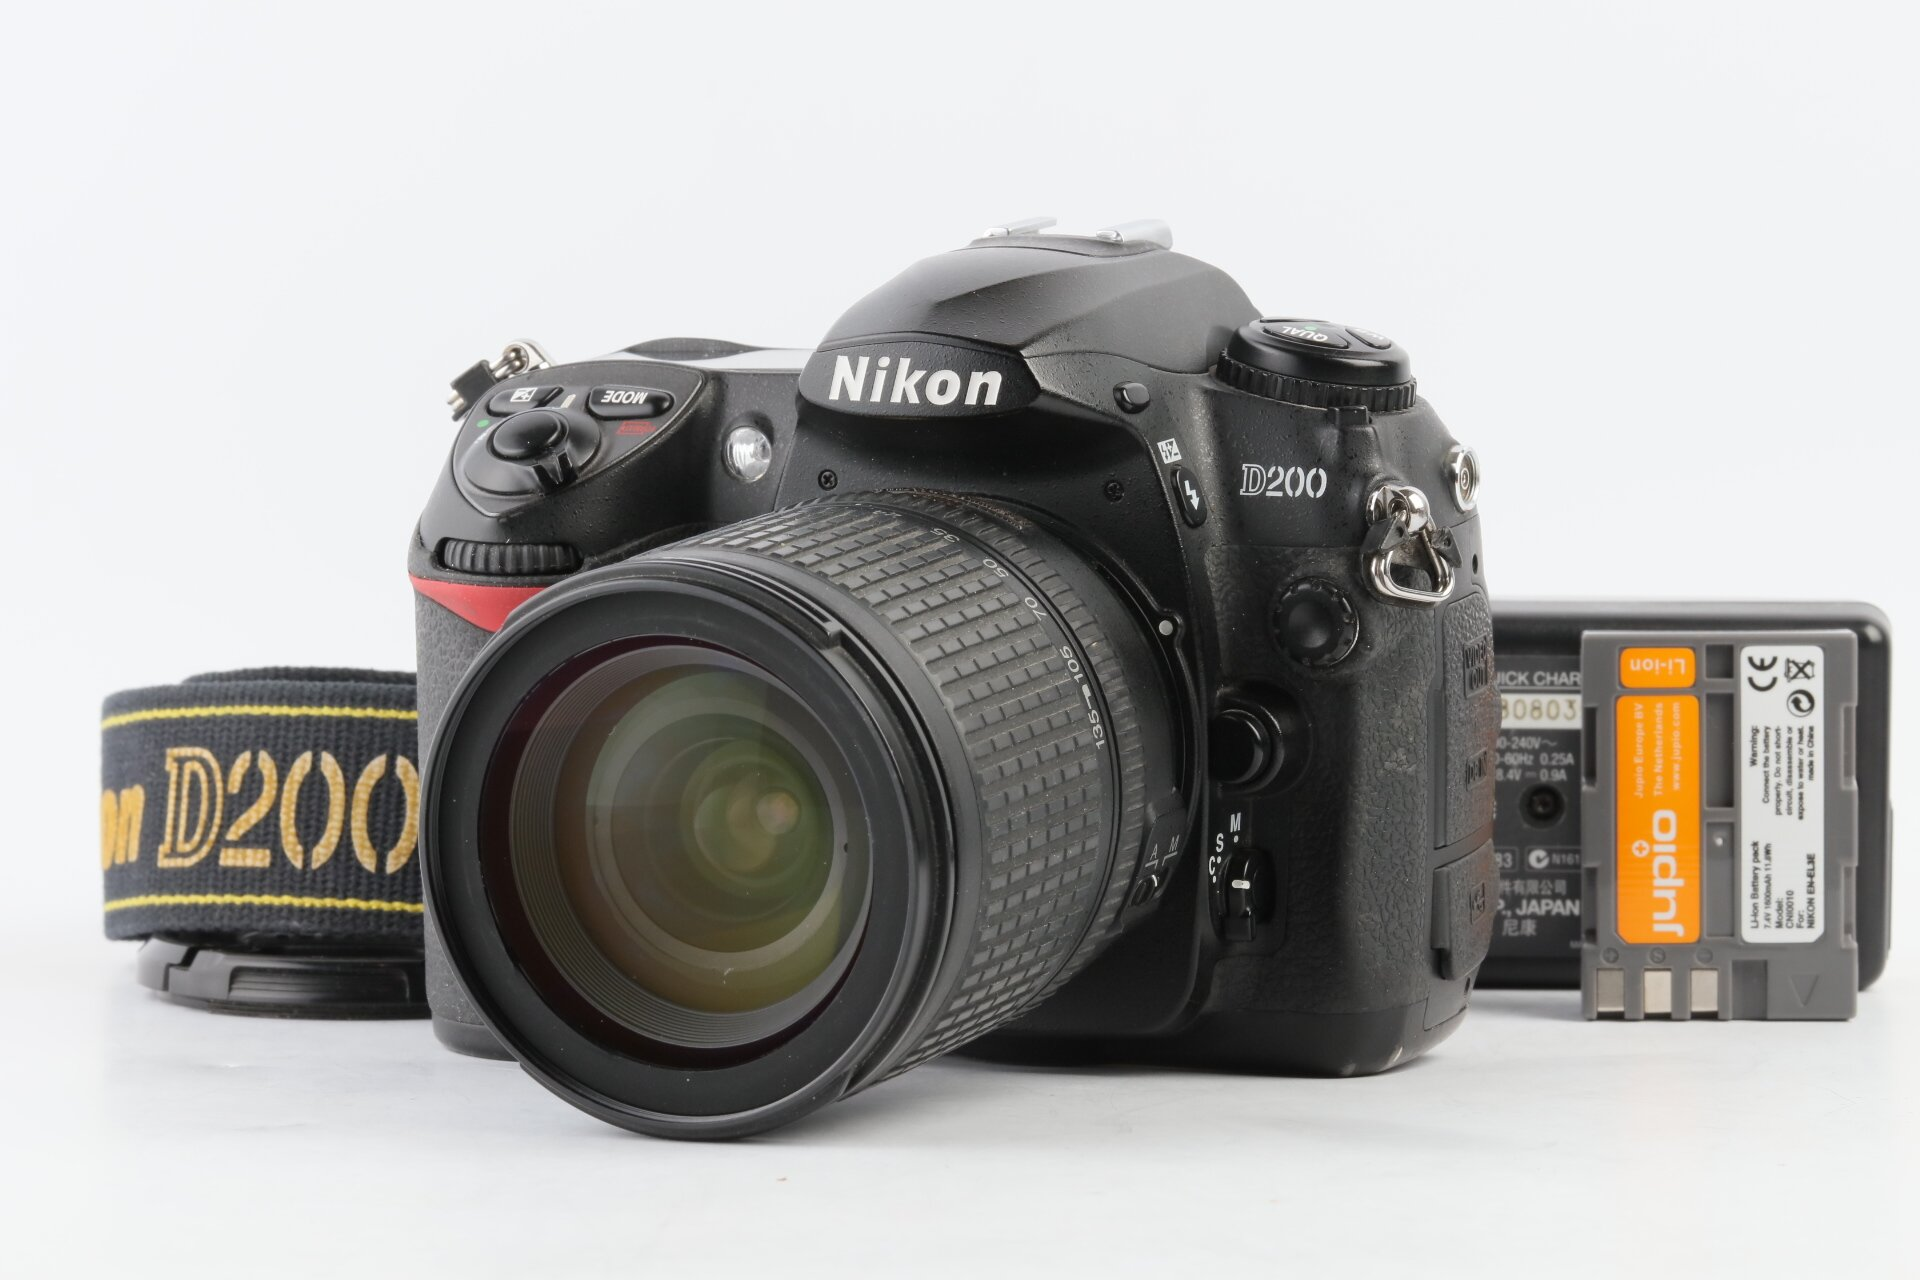 Nikon D200 + AF-S 18-135mm 3,5-5,6 G ED DX ca. 20.000 Auslösungen